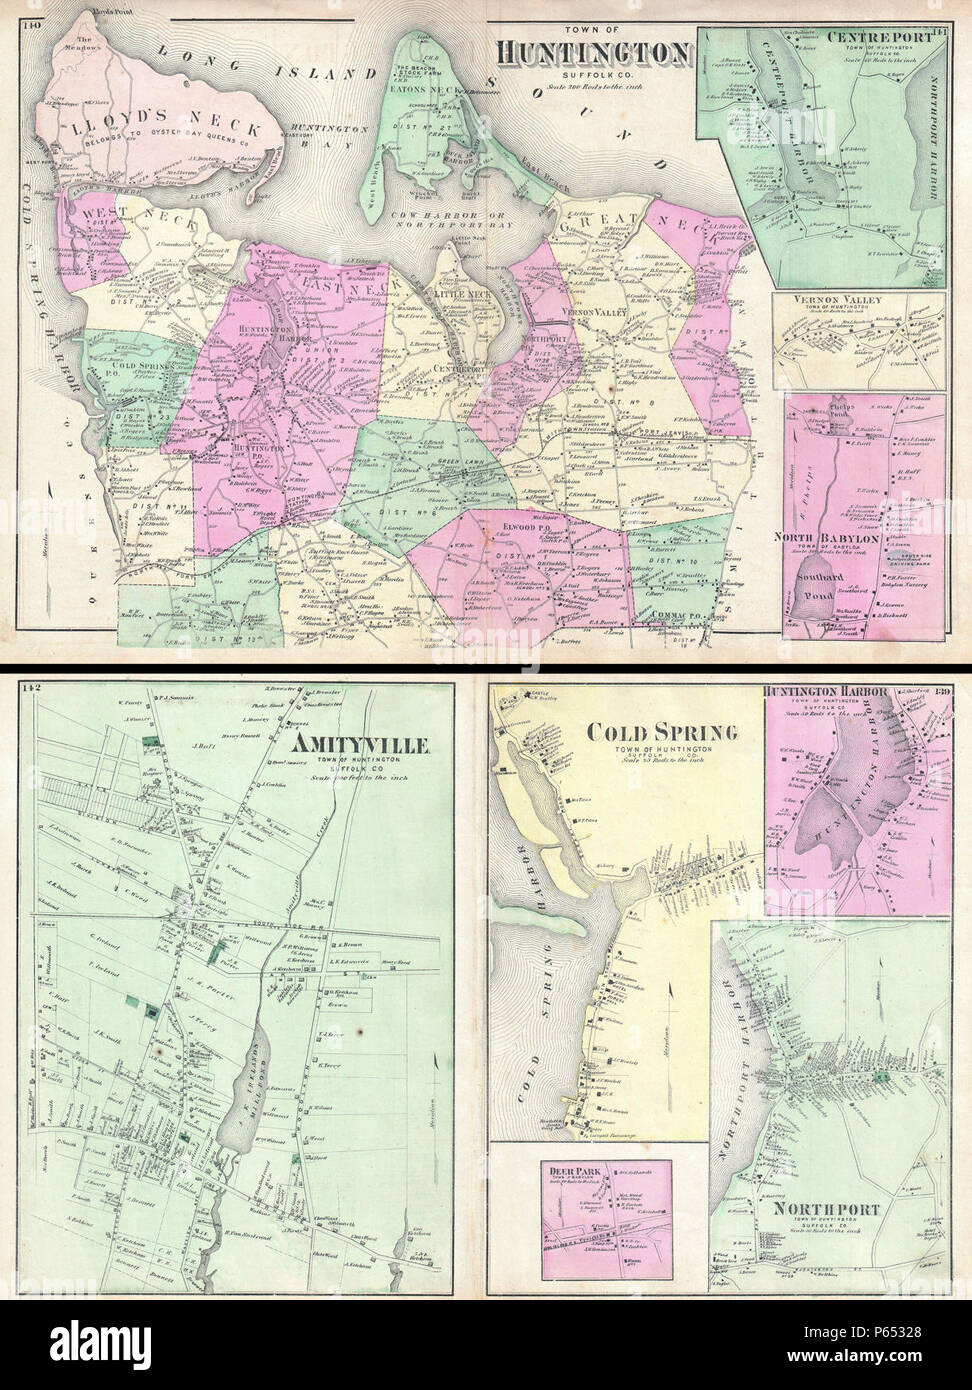 Vitesse datant comté de Suffolk New York